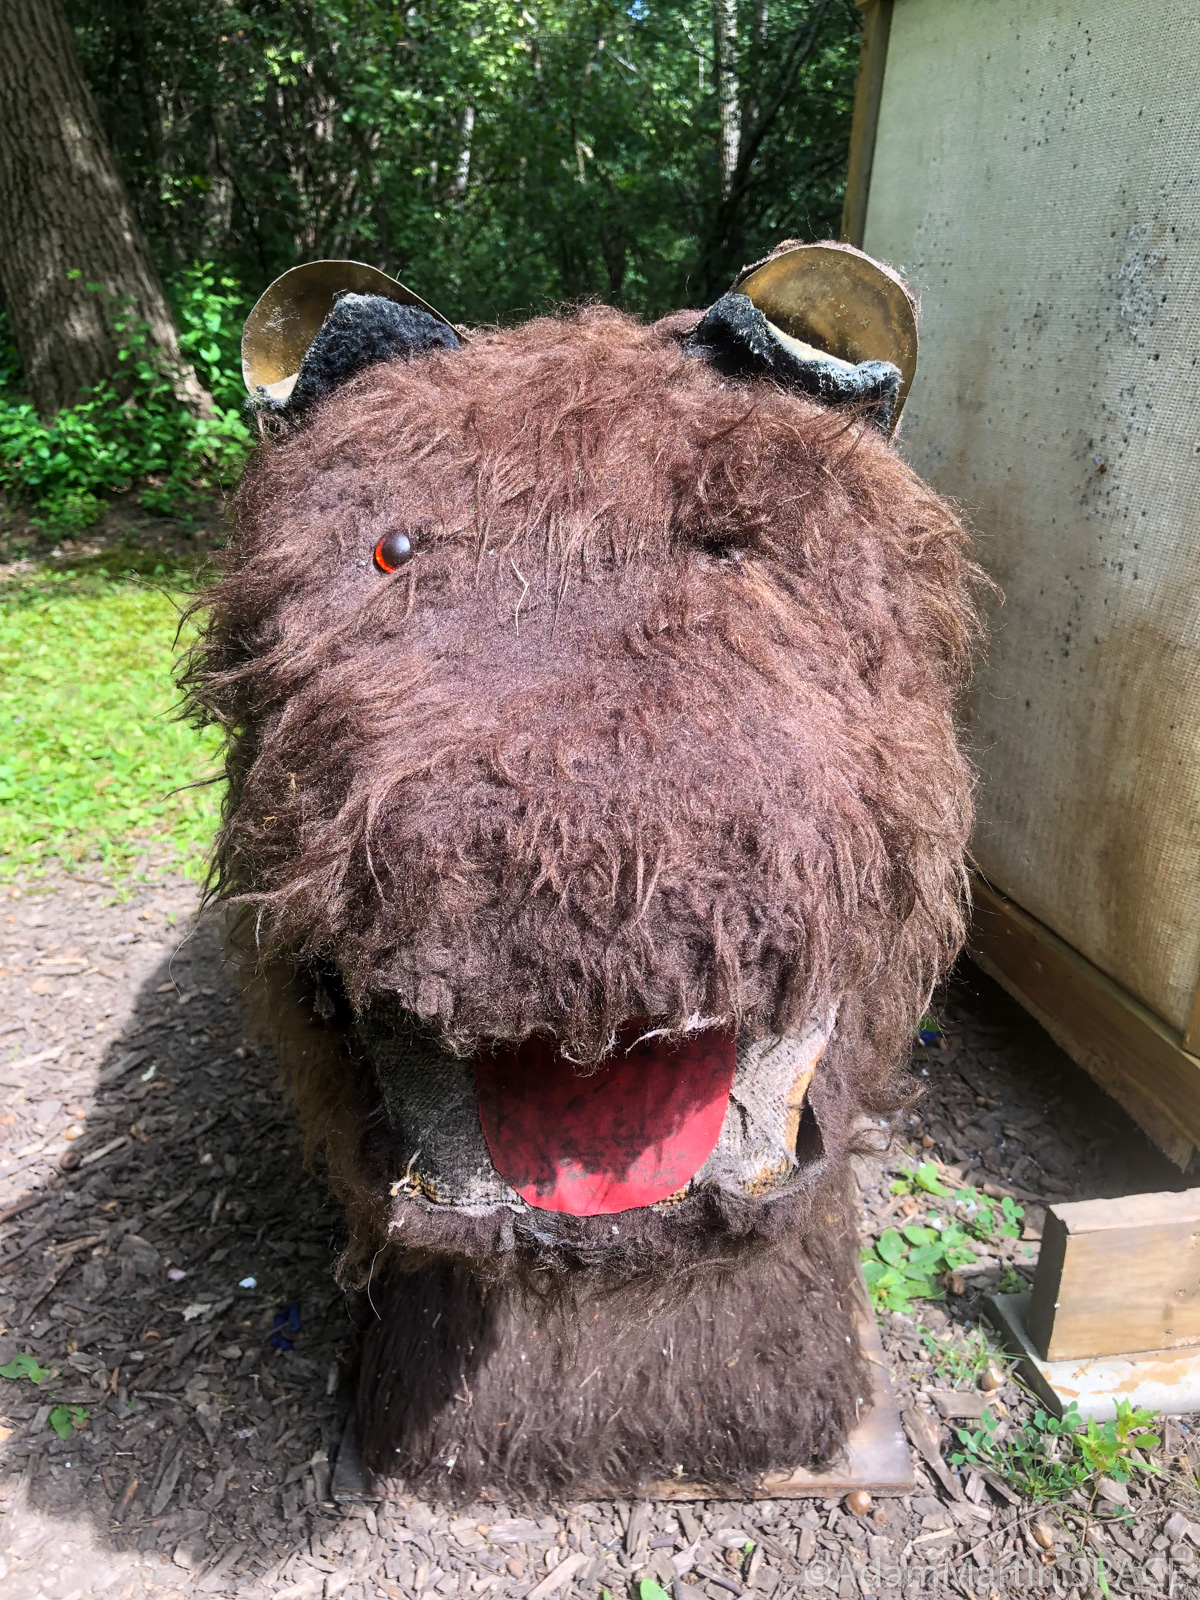 Safari Shoot @ West Allis Bowmen - Mystery creature target